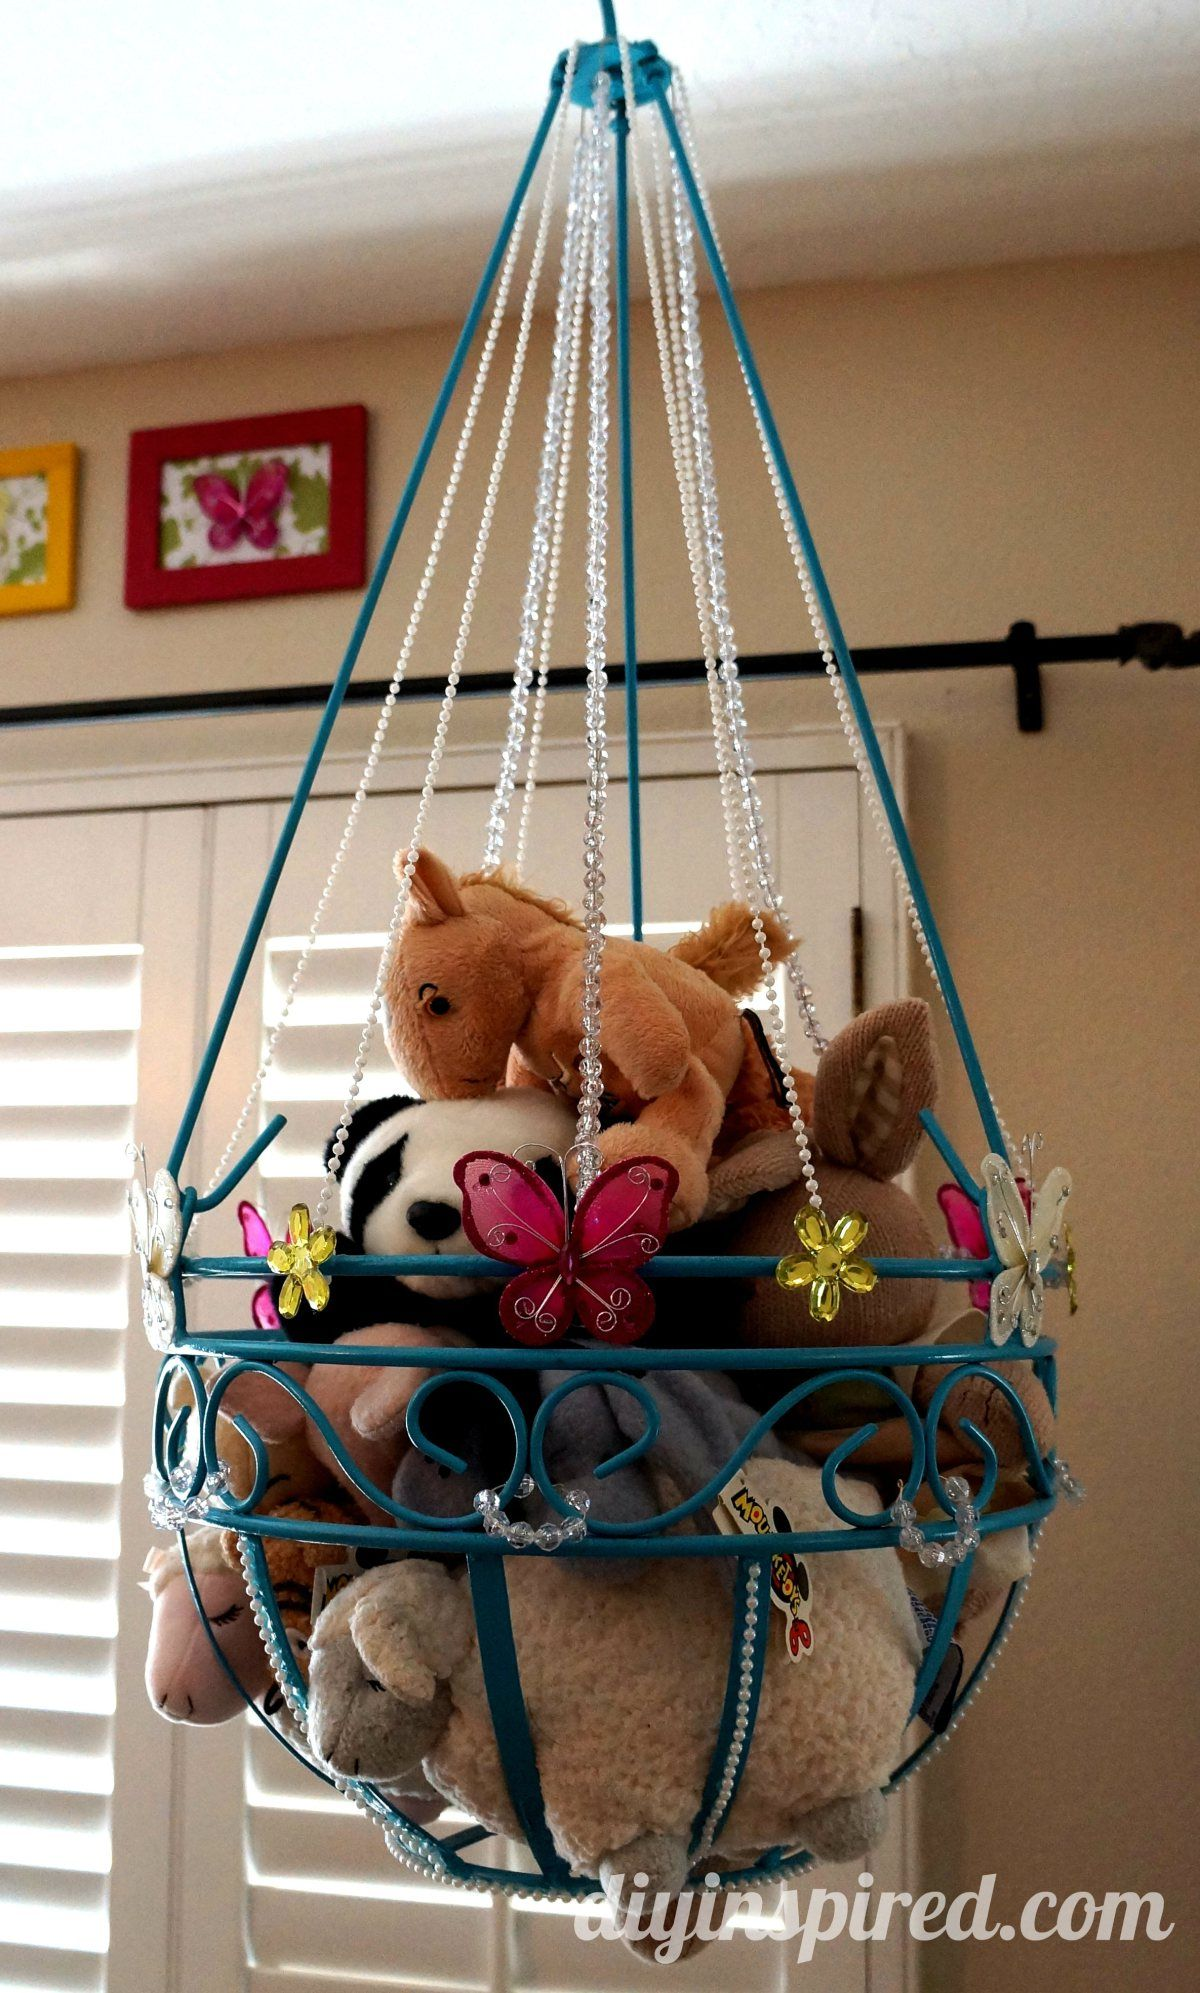 Best Of Diy Inspired Repurposed Plant Hanger Turned Stuffed Animal